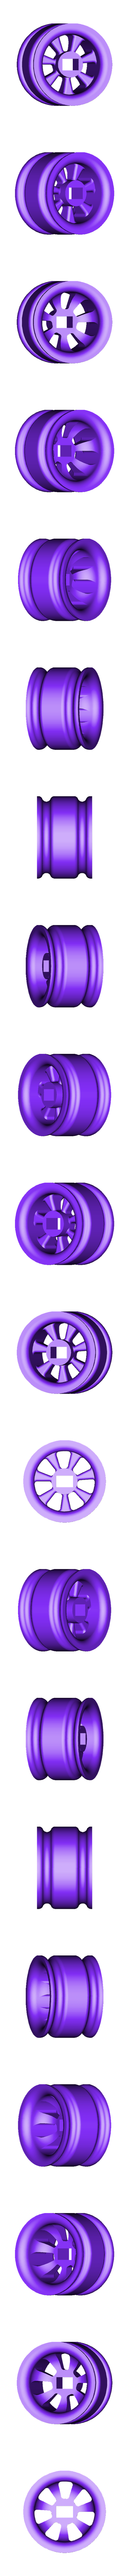 rim_1.5mm_offset.stl Download free STL file Orlandoo Hunter crawler wider rims • 3D printing model, VICLER